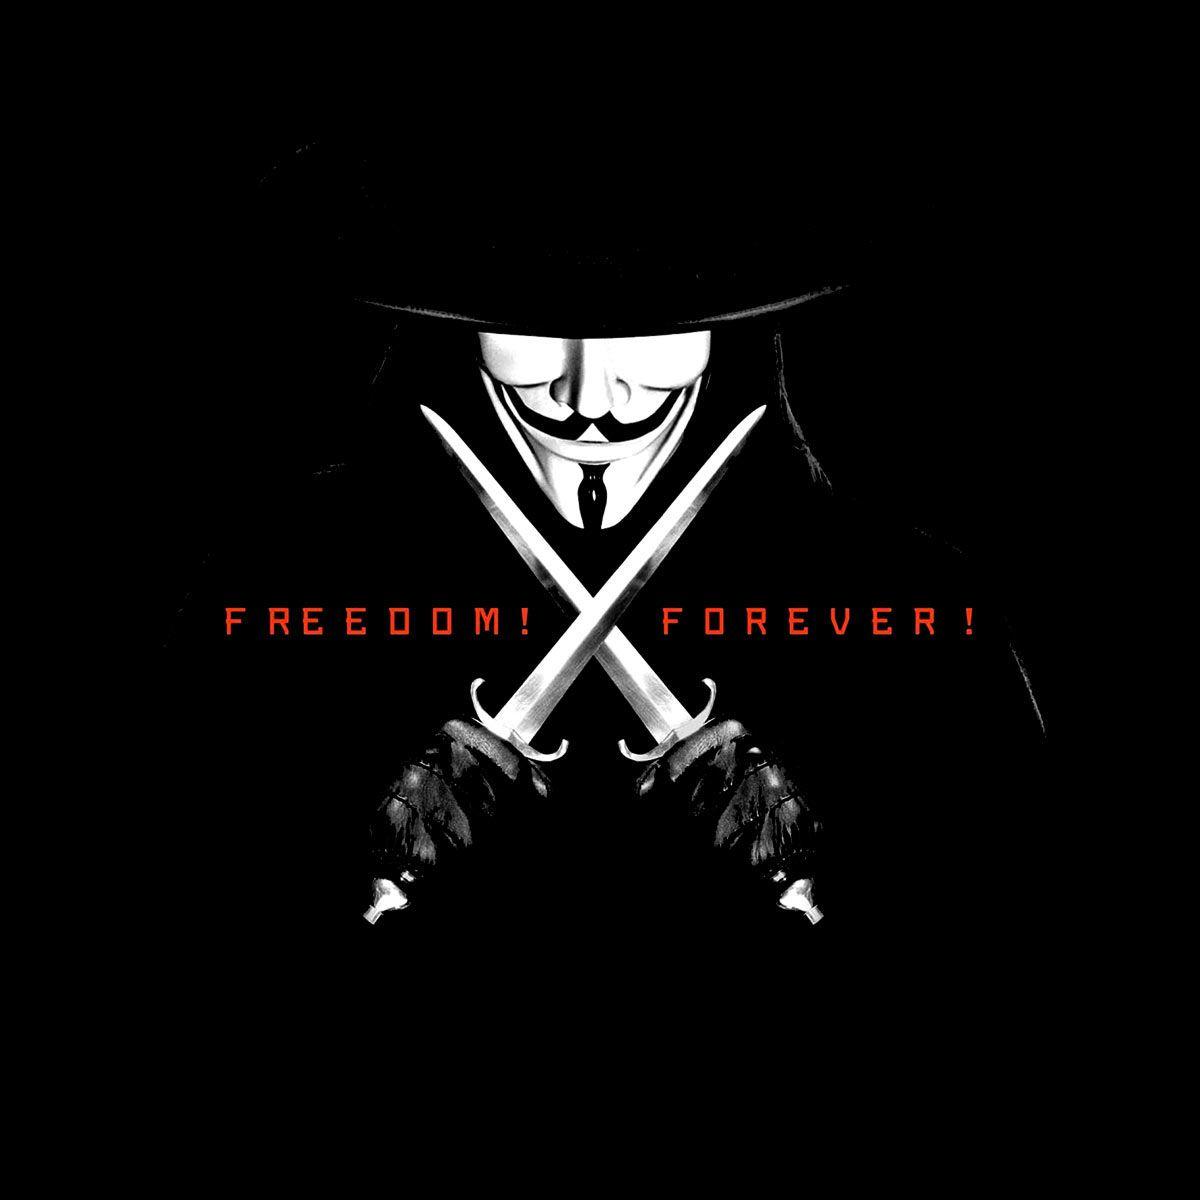 Sudadera V De Vendetta Freedom Forever V For Vendetta Vendetta Movies And Tv Shows